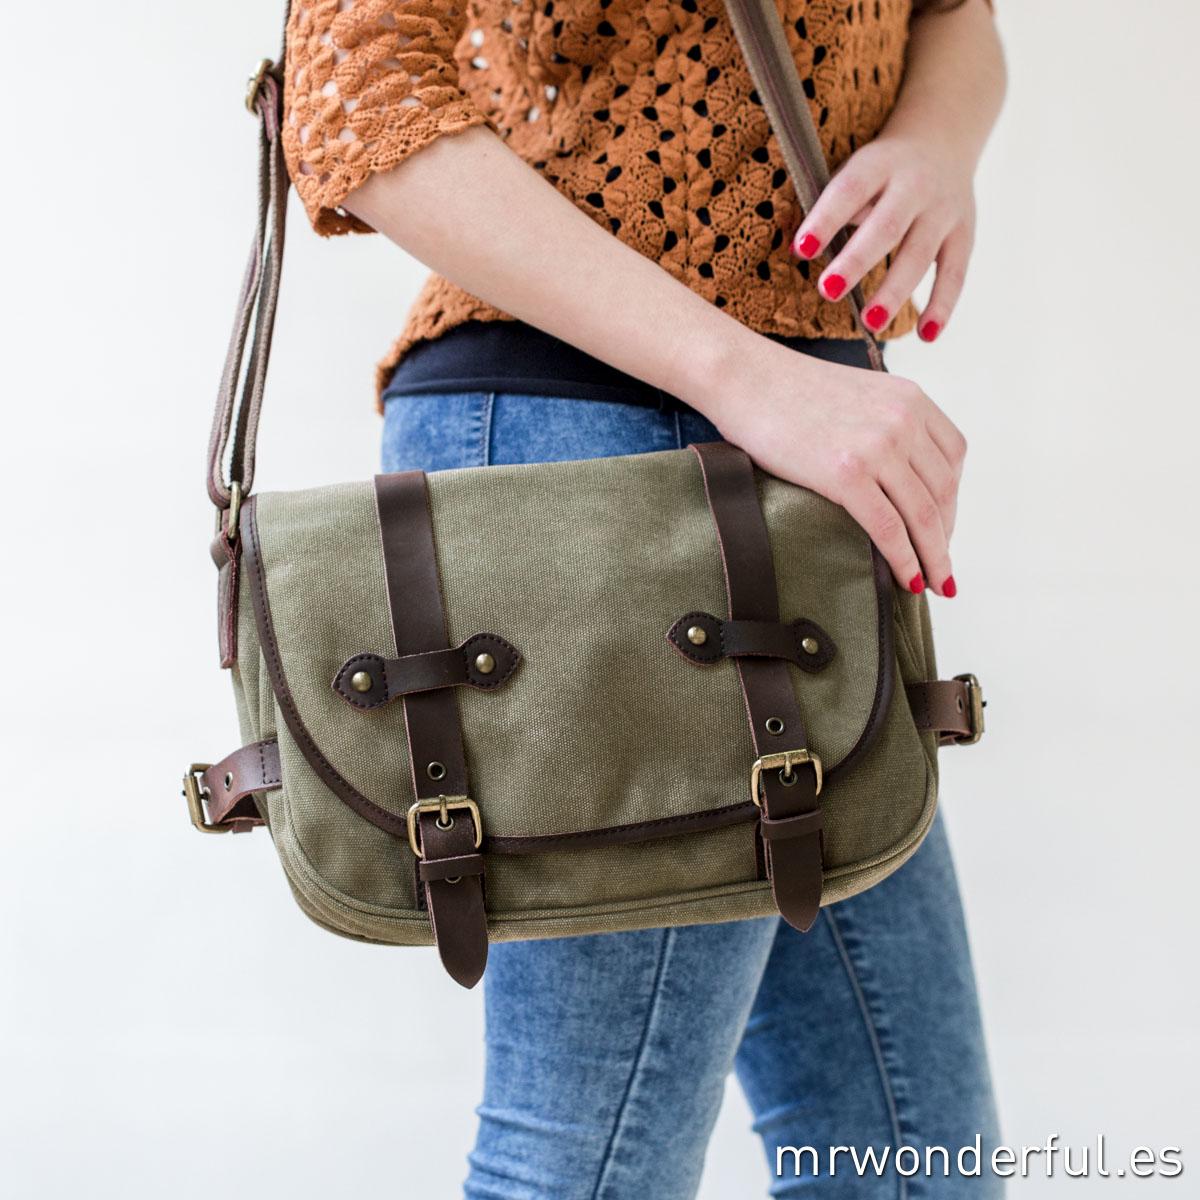 mrwonderful_bags_8050-1-Olive-45